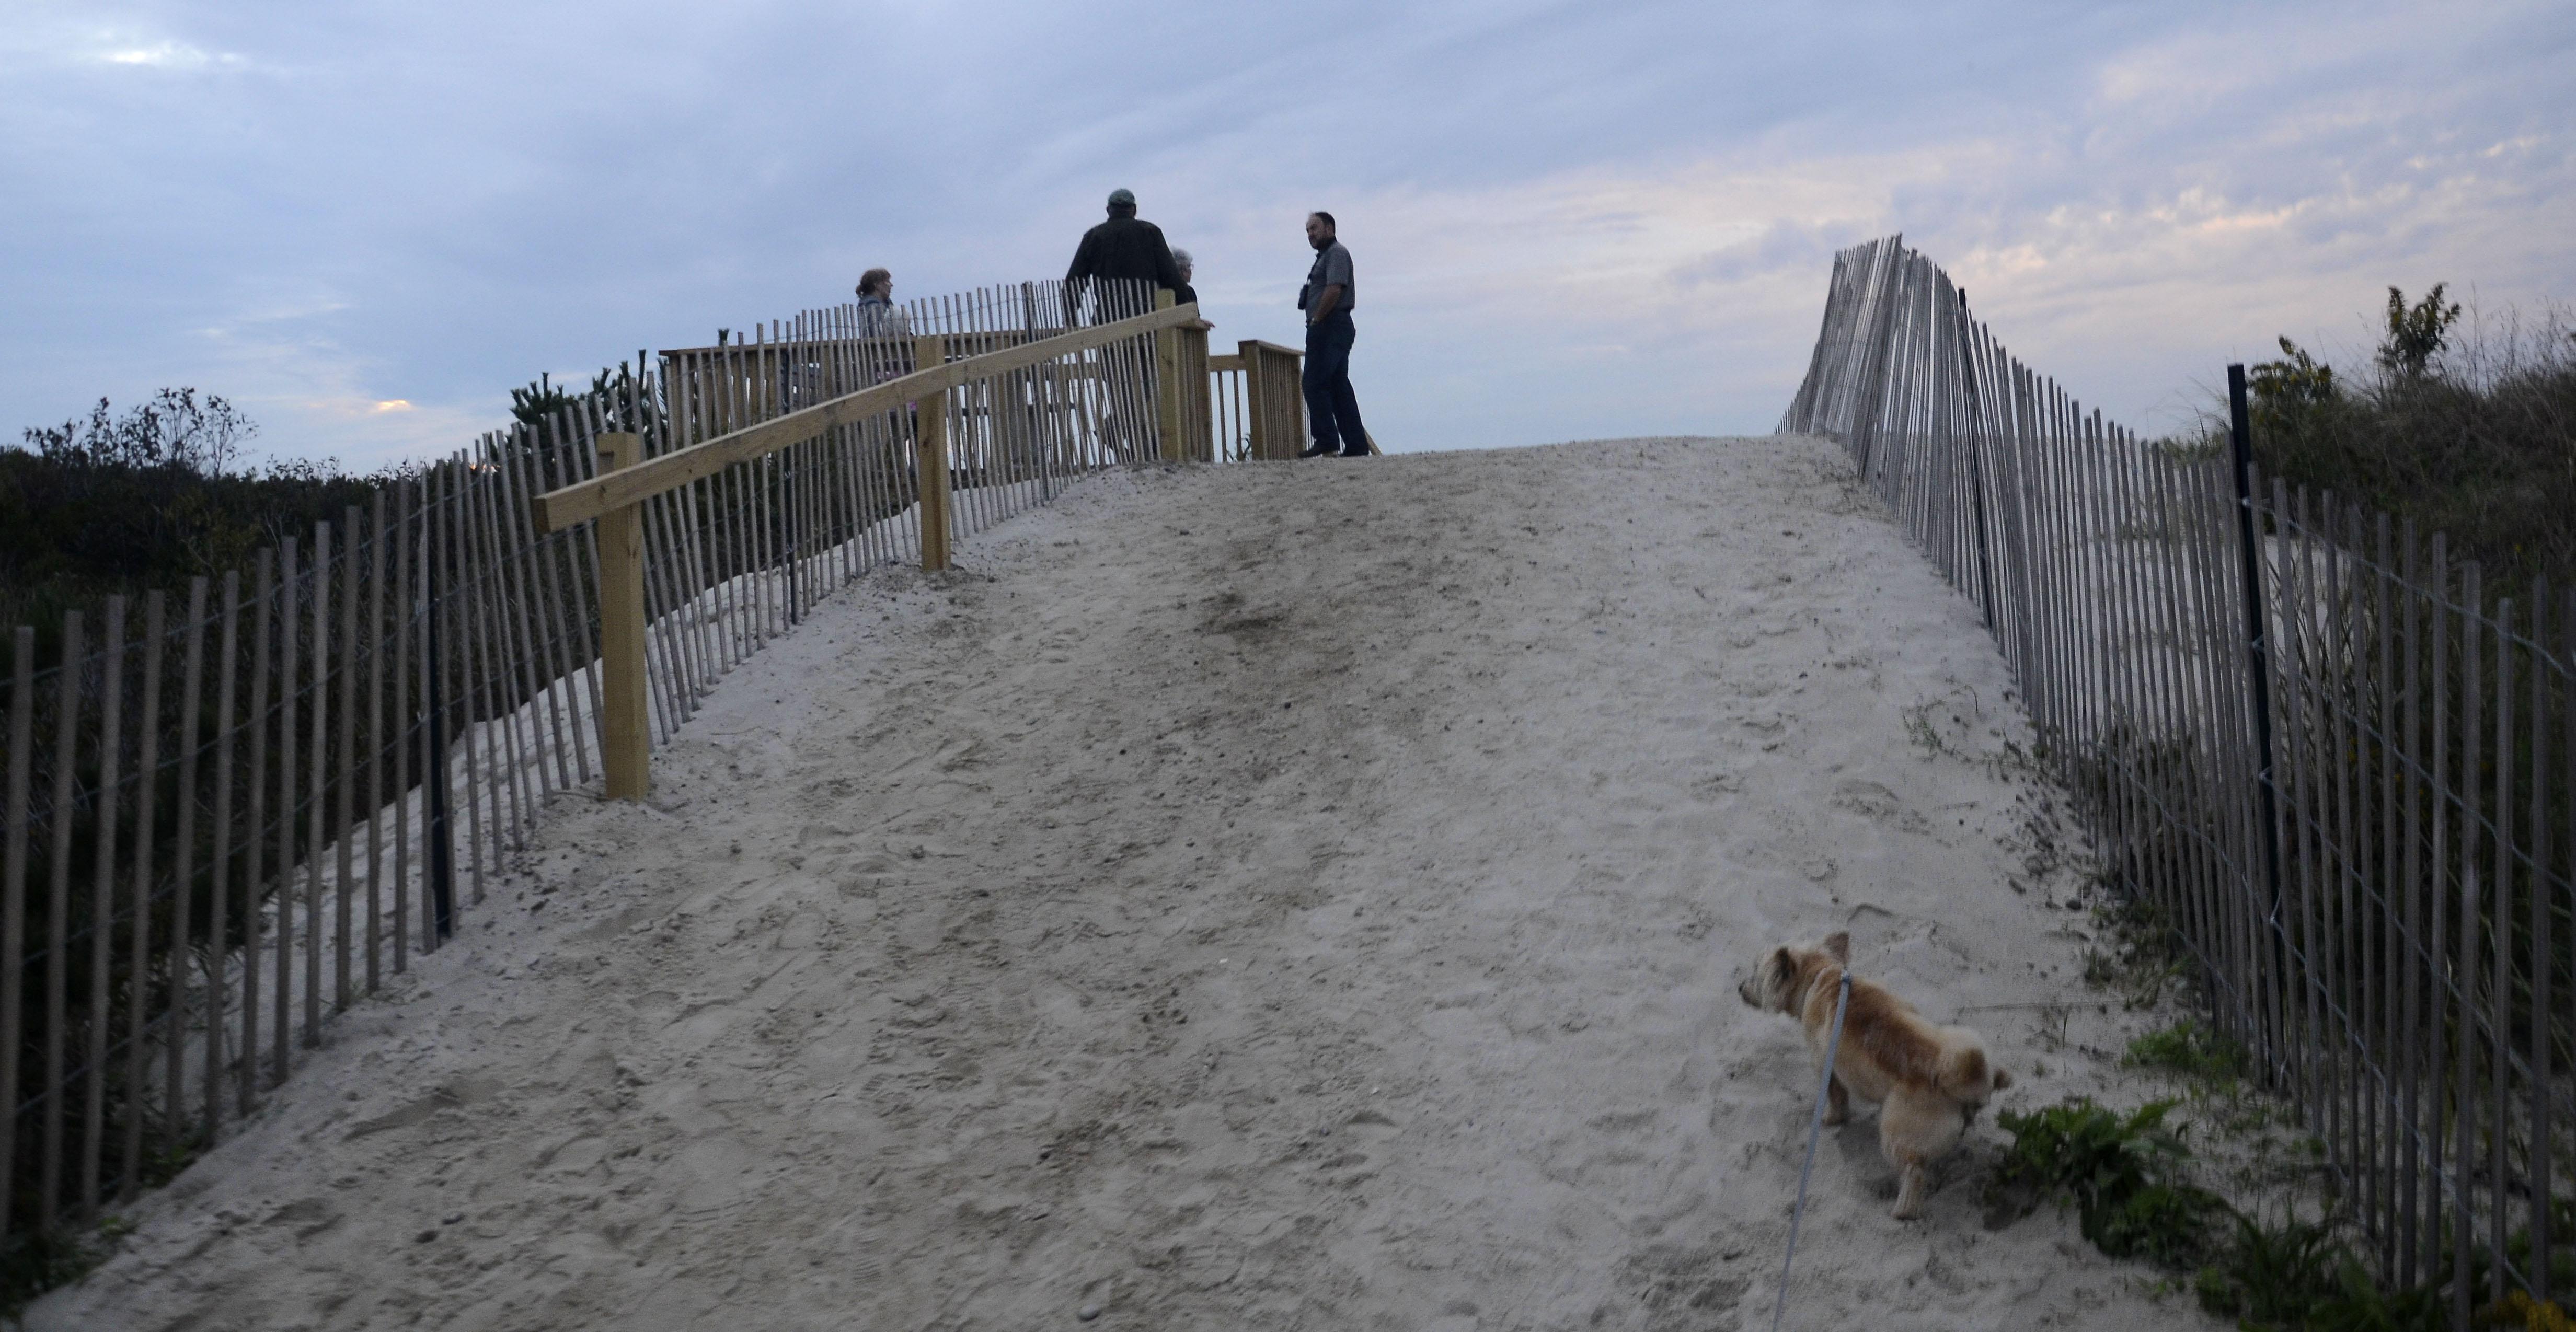 dog walks up hill towards beach